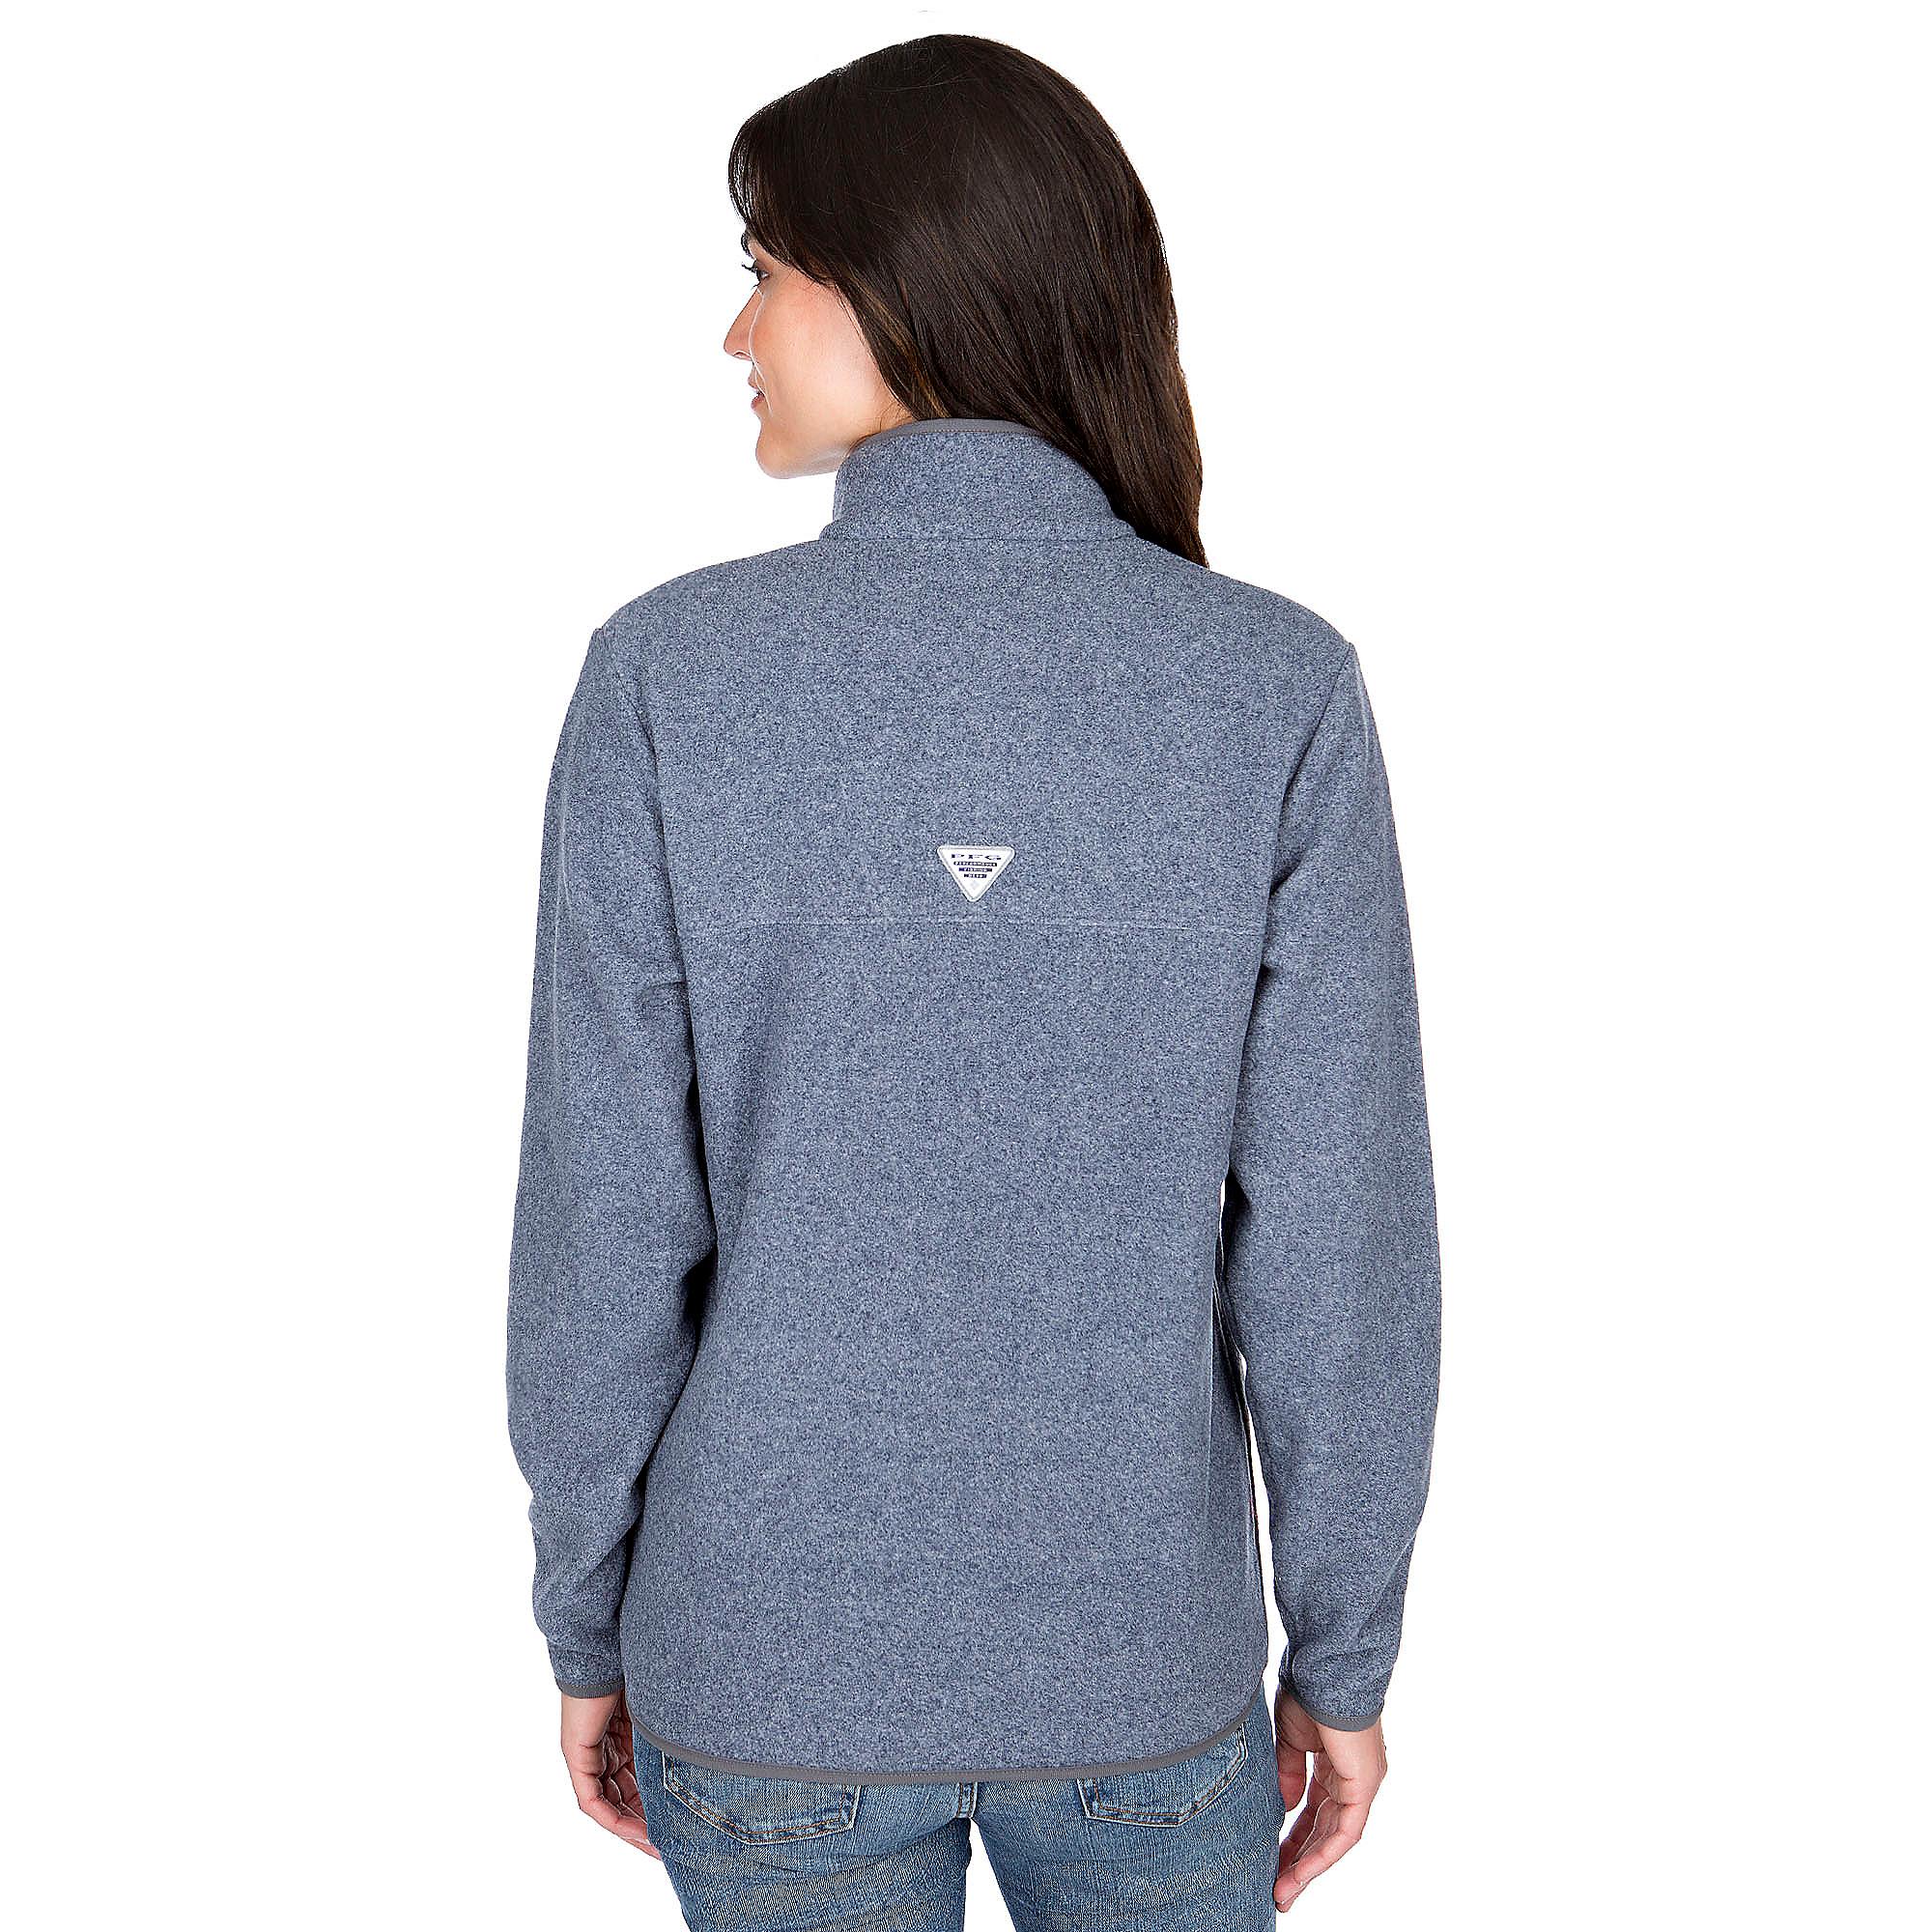 check out e9c25 4b262 Dallas Cowboys Columbia Womens Harborside Fleece Half-Zip ...